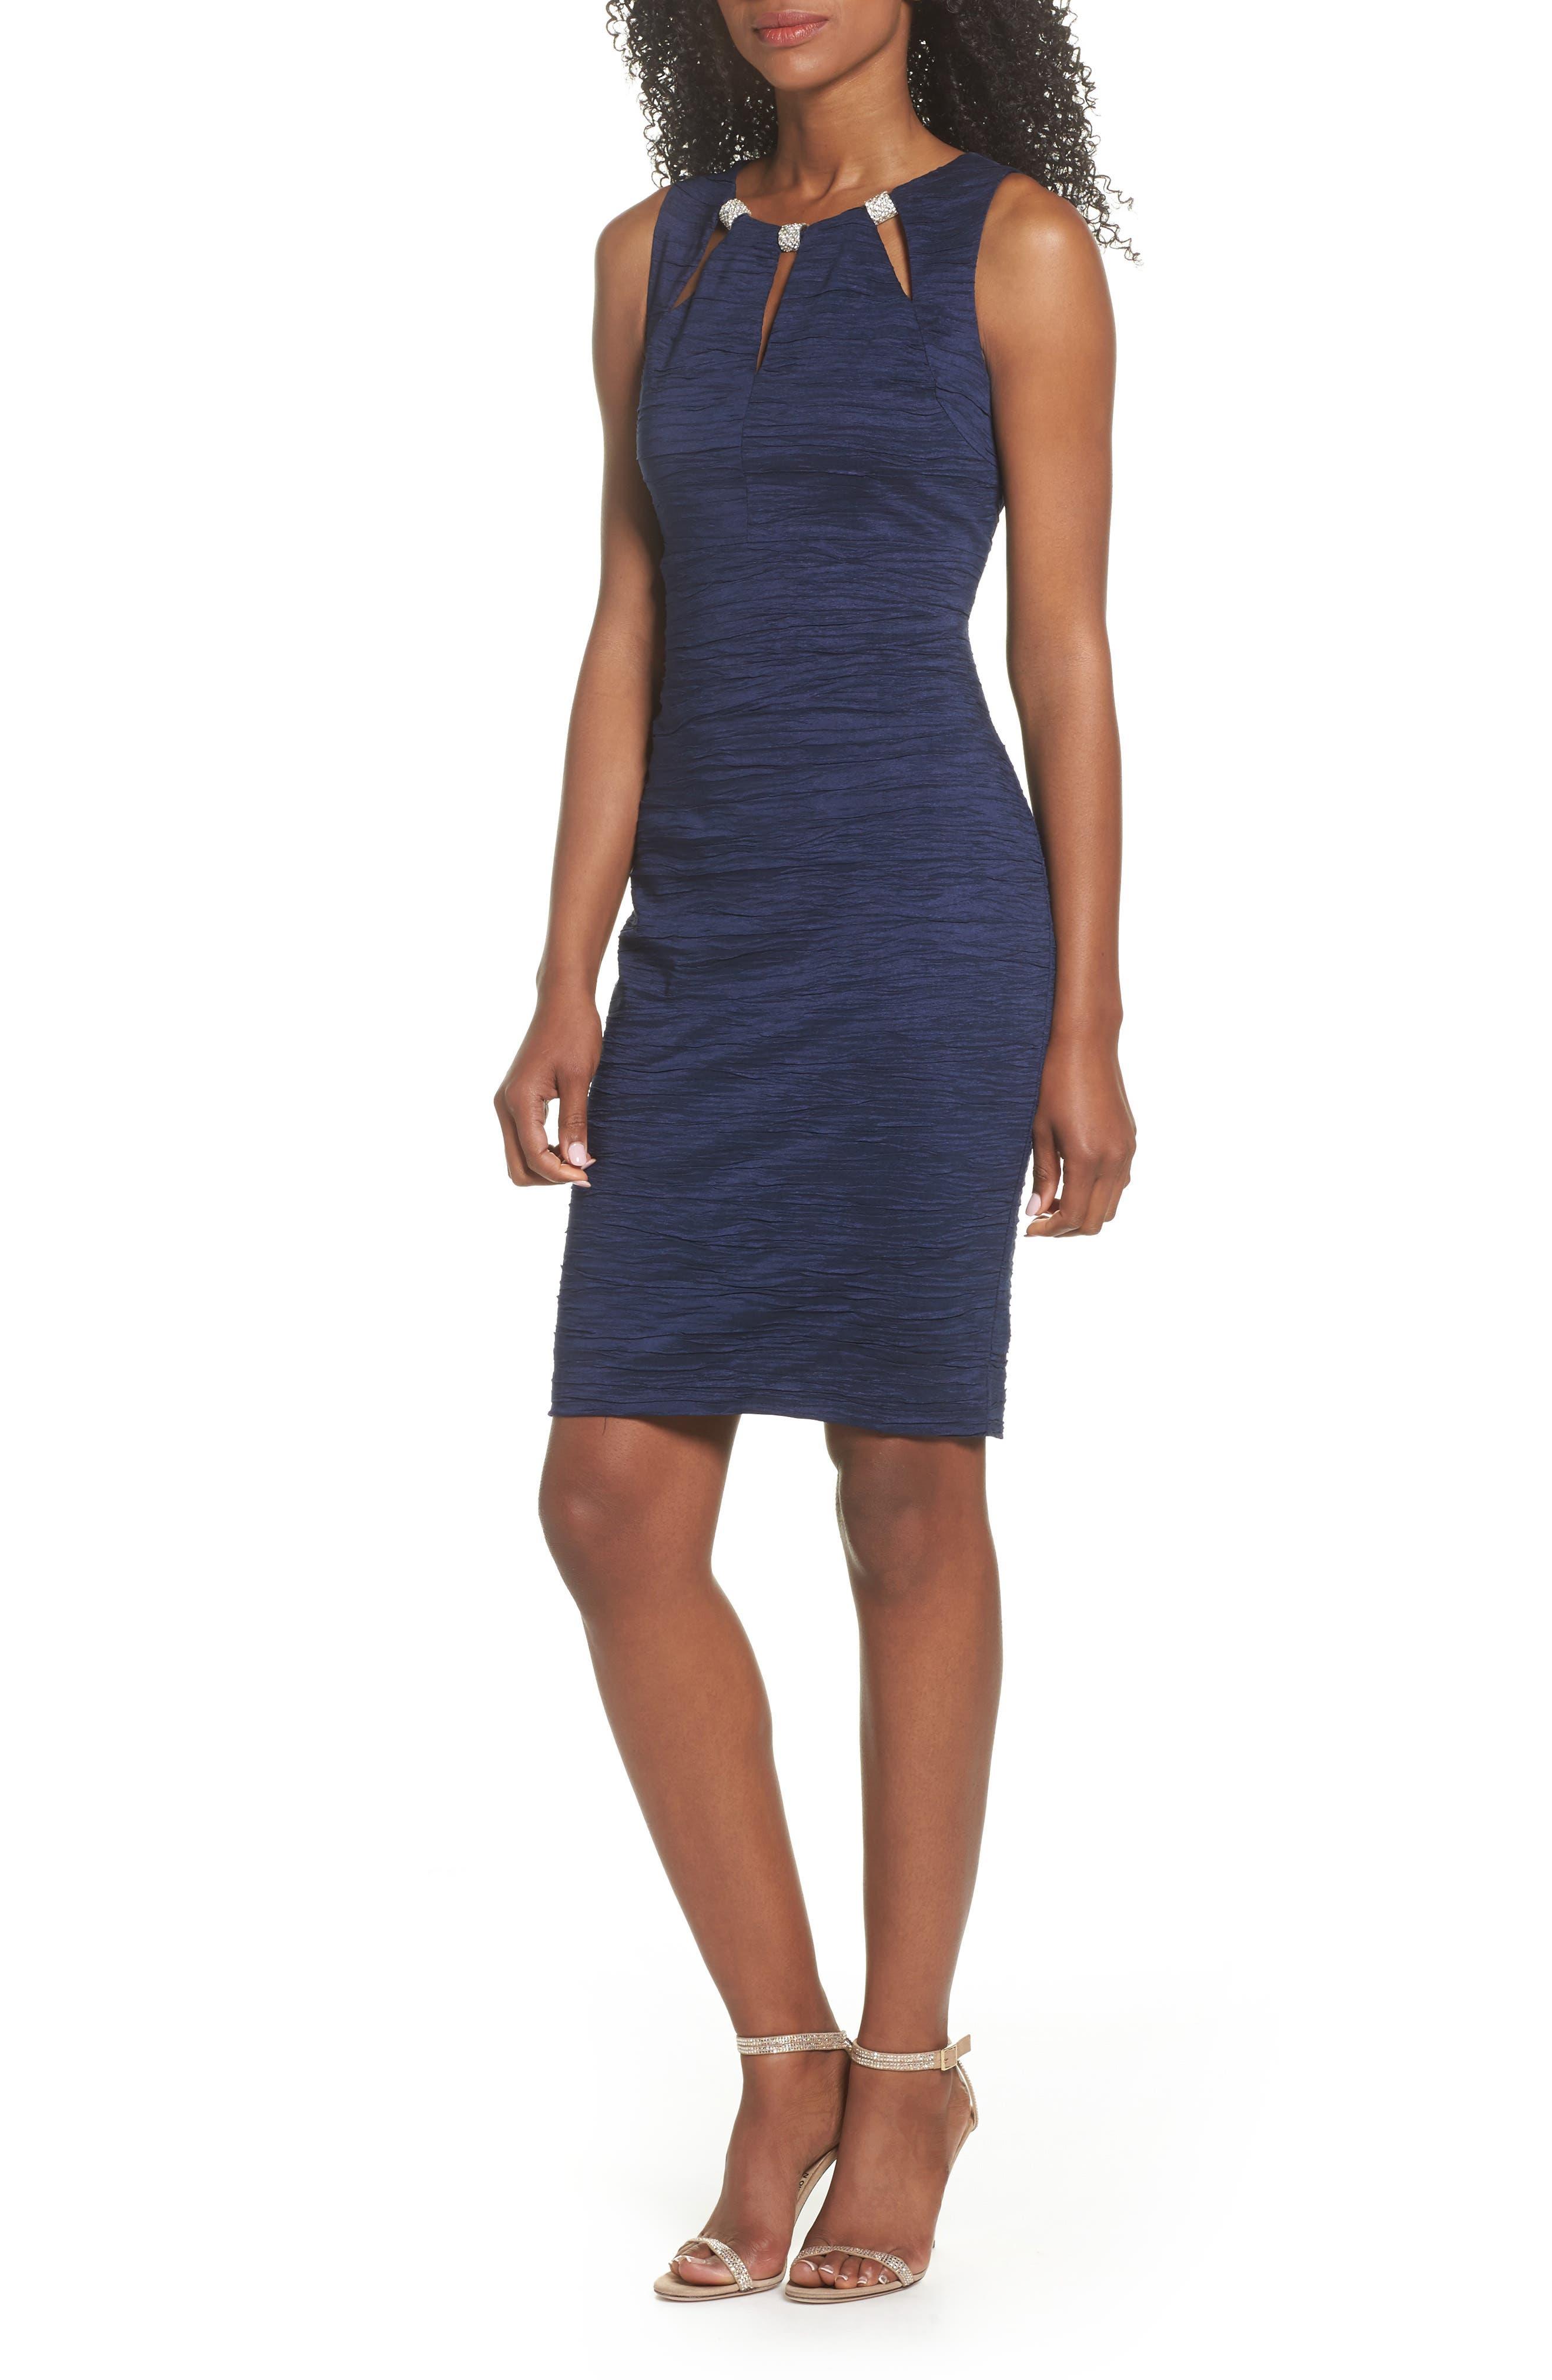 Alternate Image 1 Selected - Eliza J Embellished Cutout Taffeta Sheath Dress (Regular & Petite)